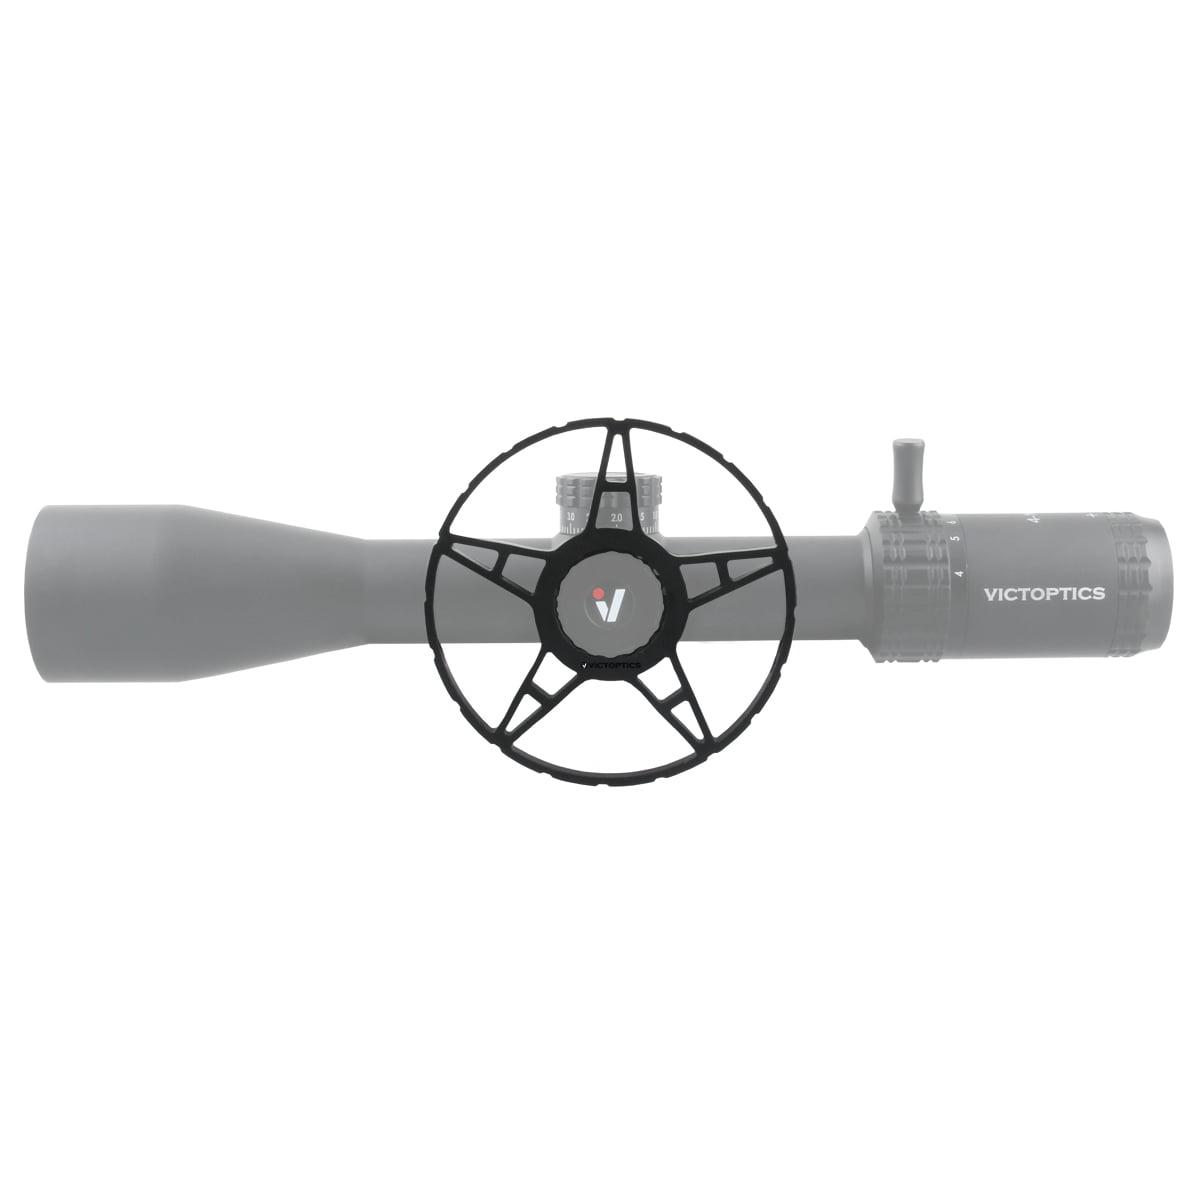 Victoptics S4 Riflescope Big Side Wheel Accpet OEM & ODM